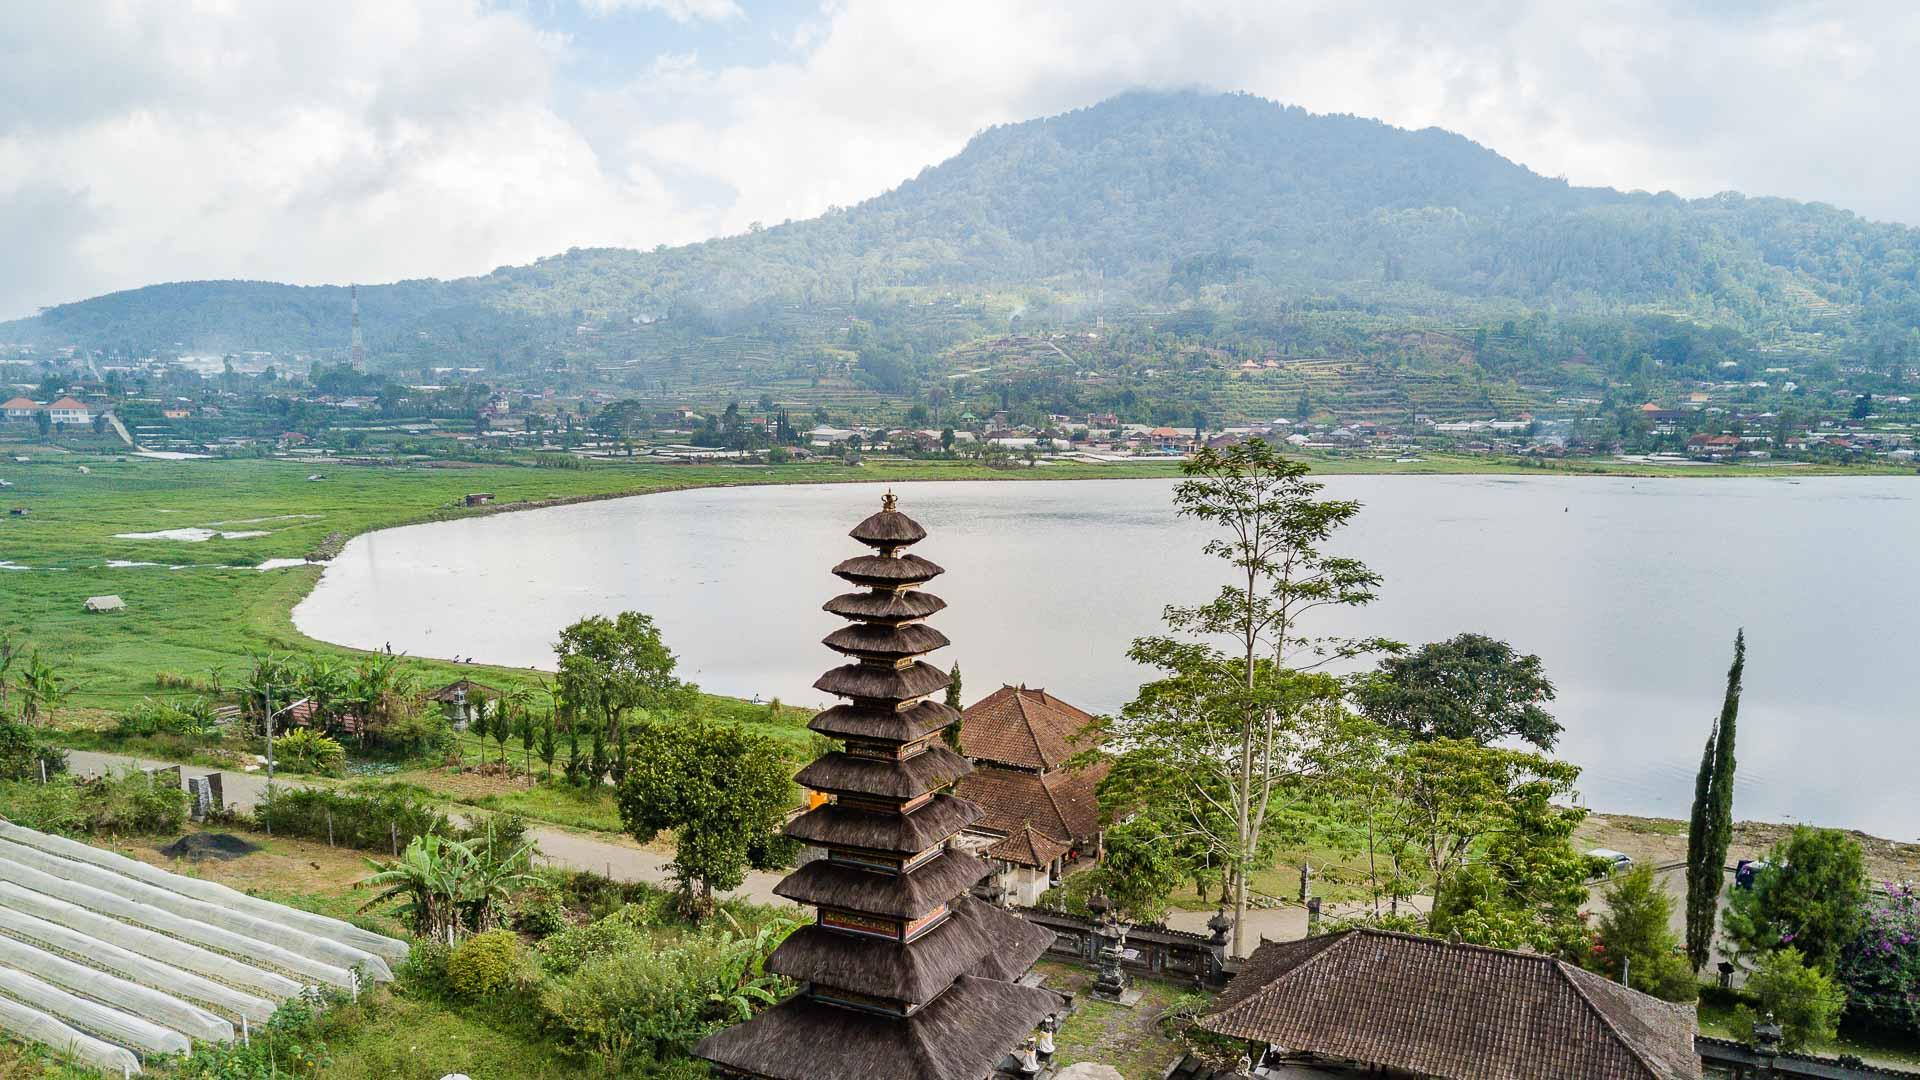 Munduk: The most beautiful region of Bali